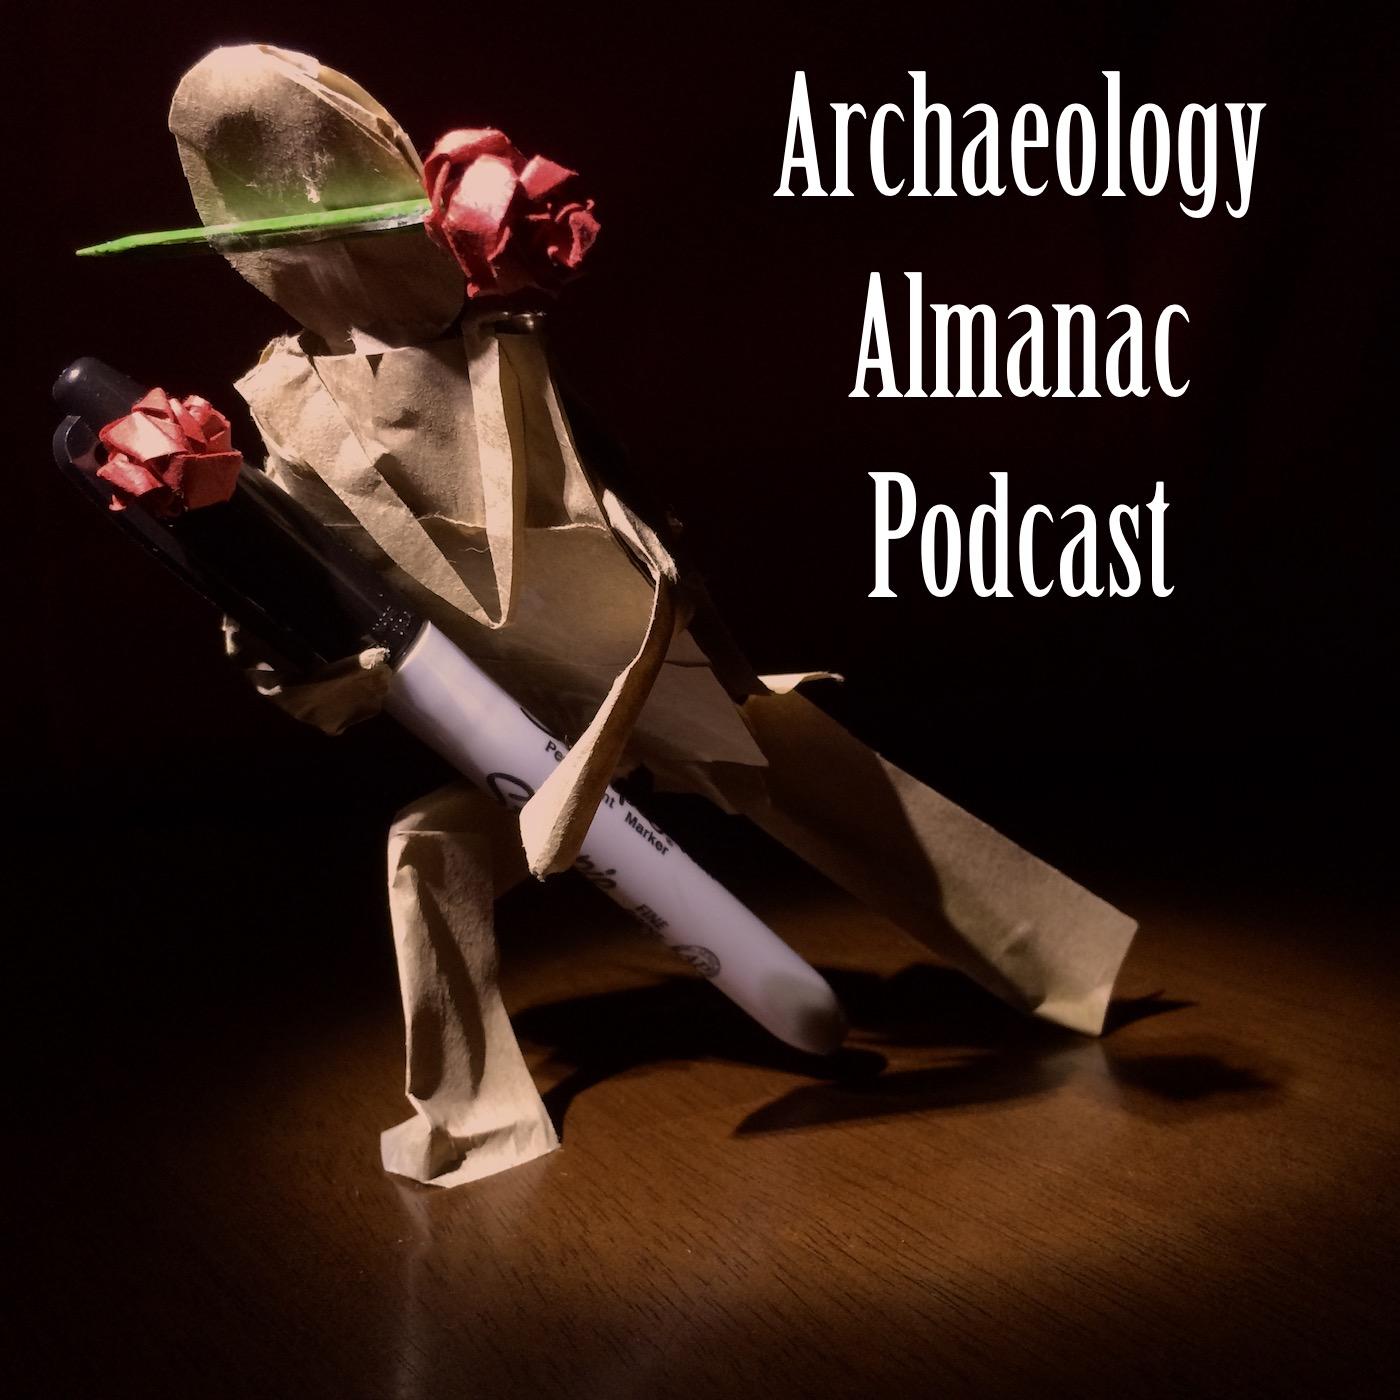 Archaeology Almanac